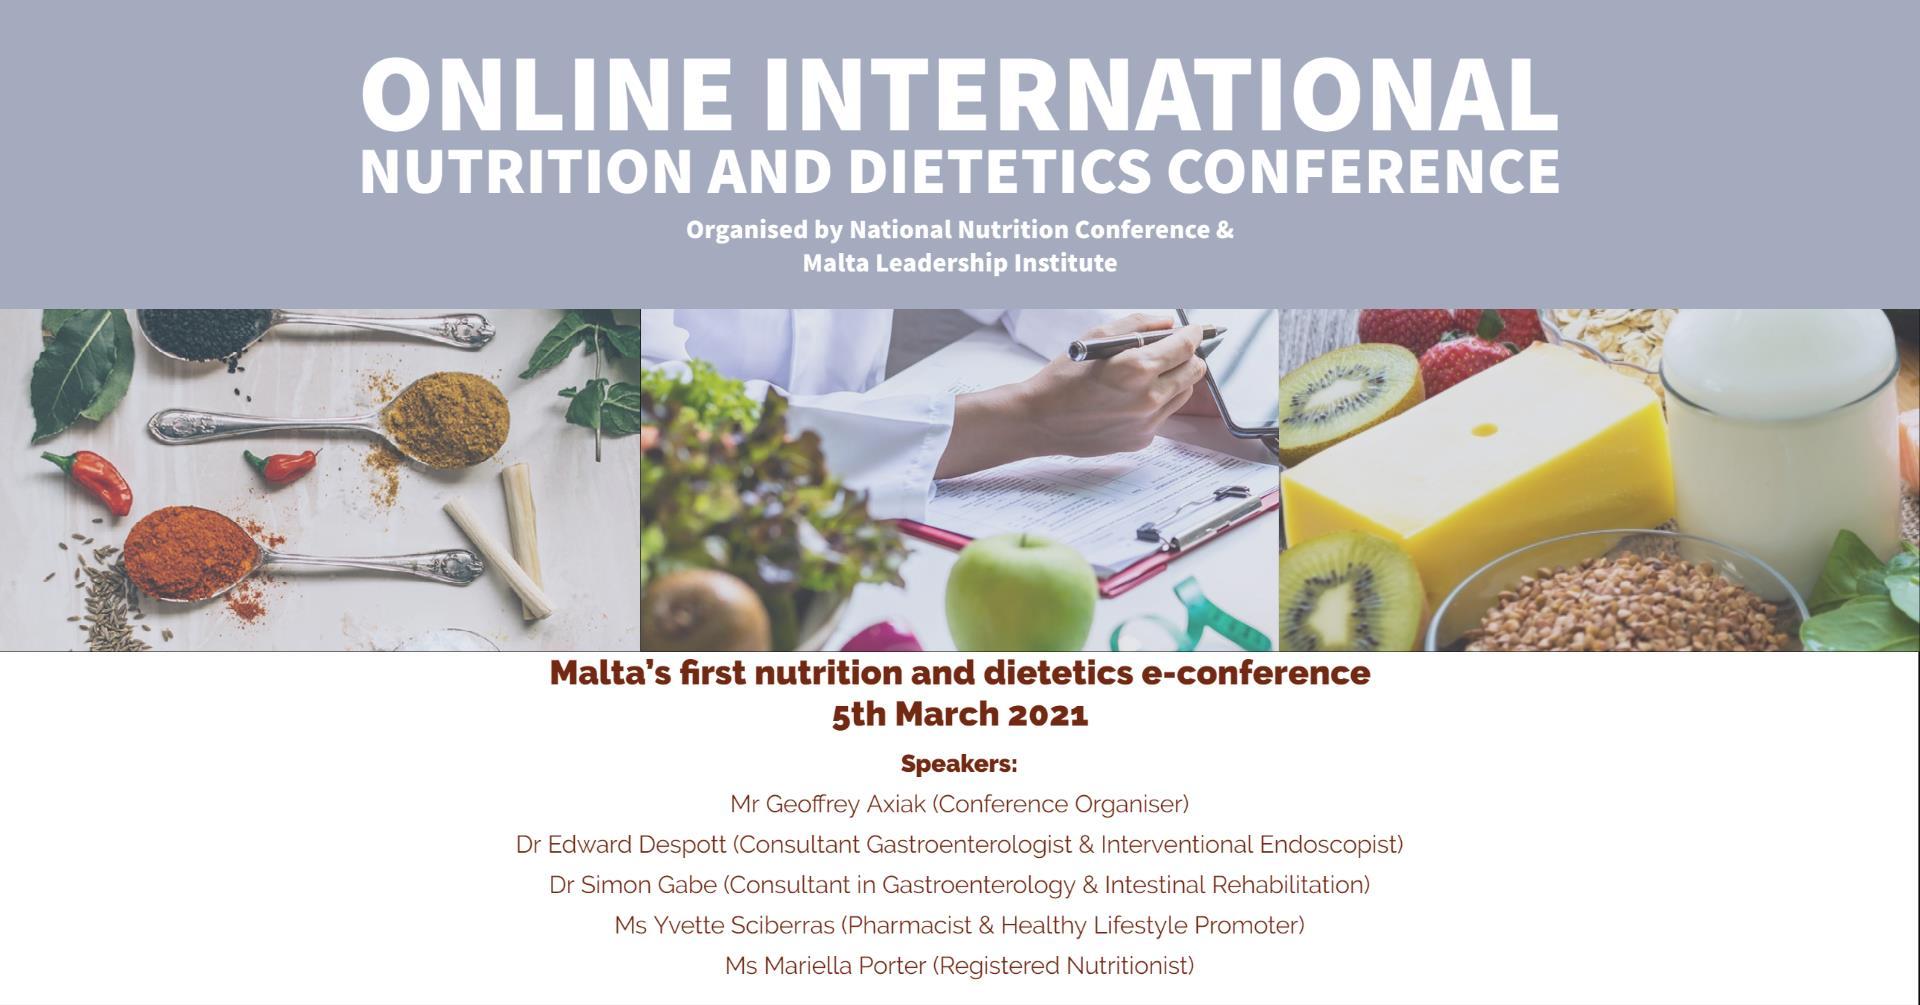 Online Nutrition & Dietetics Conference